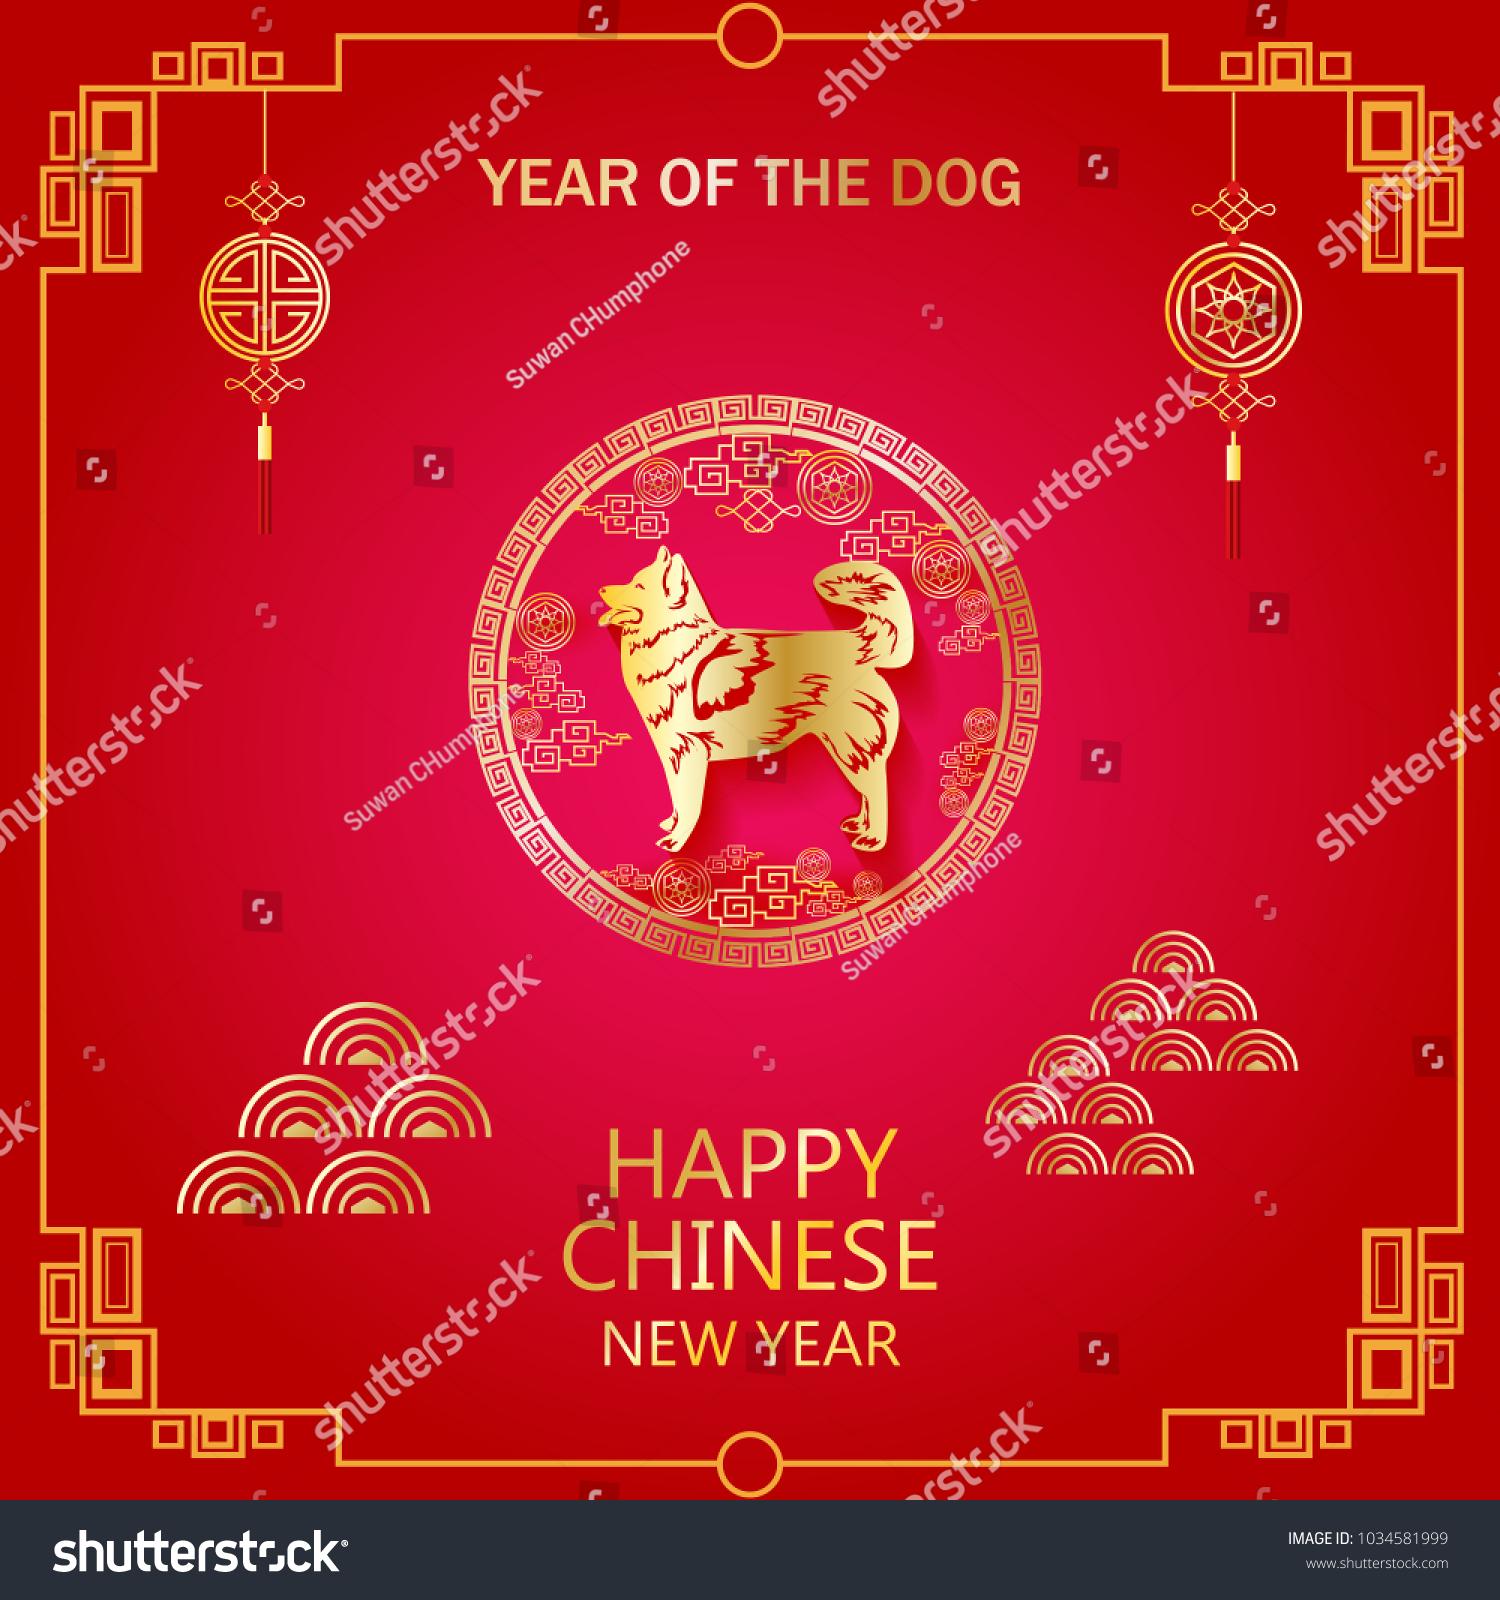 Chinese new year dog zodiac symbol stock vector 1034581999 chinese new year of dog zodiac symbol design for greeting cards calendars banners buycottarizona Images